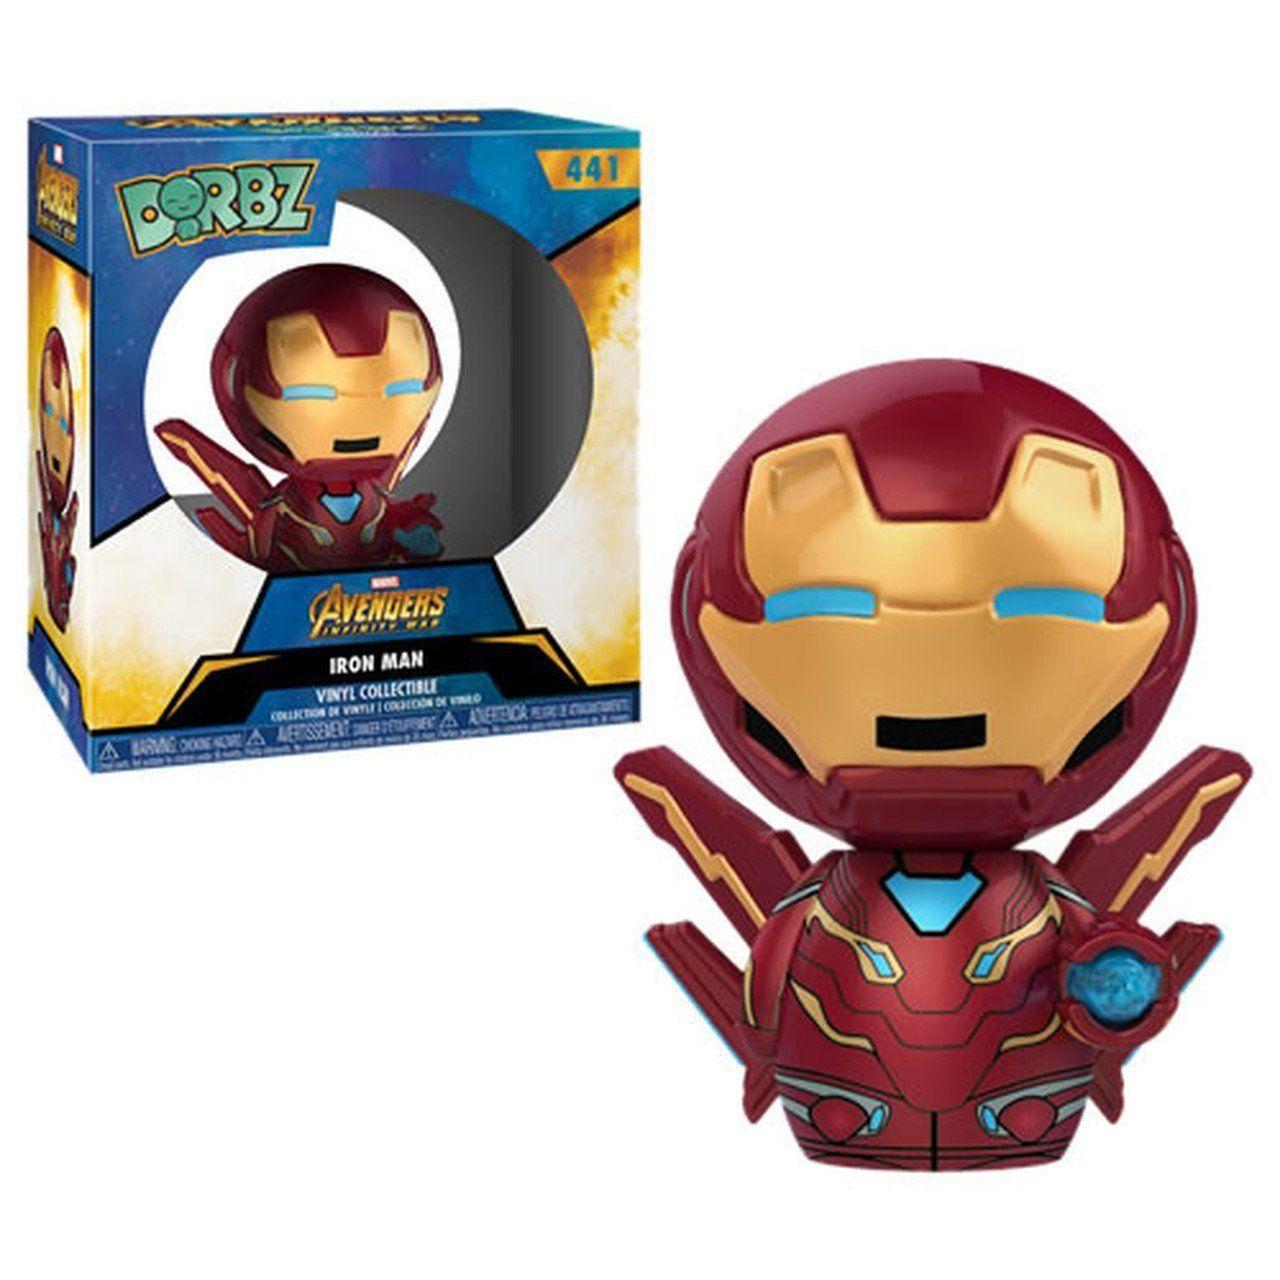 PRÉ VENDA: Dorbz! Iron Man Wings: Guerra Infinita (Avengers 3 Infinity War) #441 - Funko